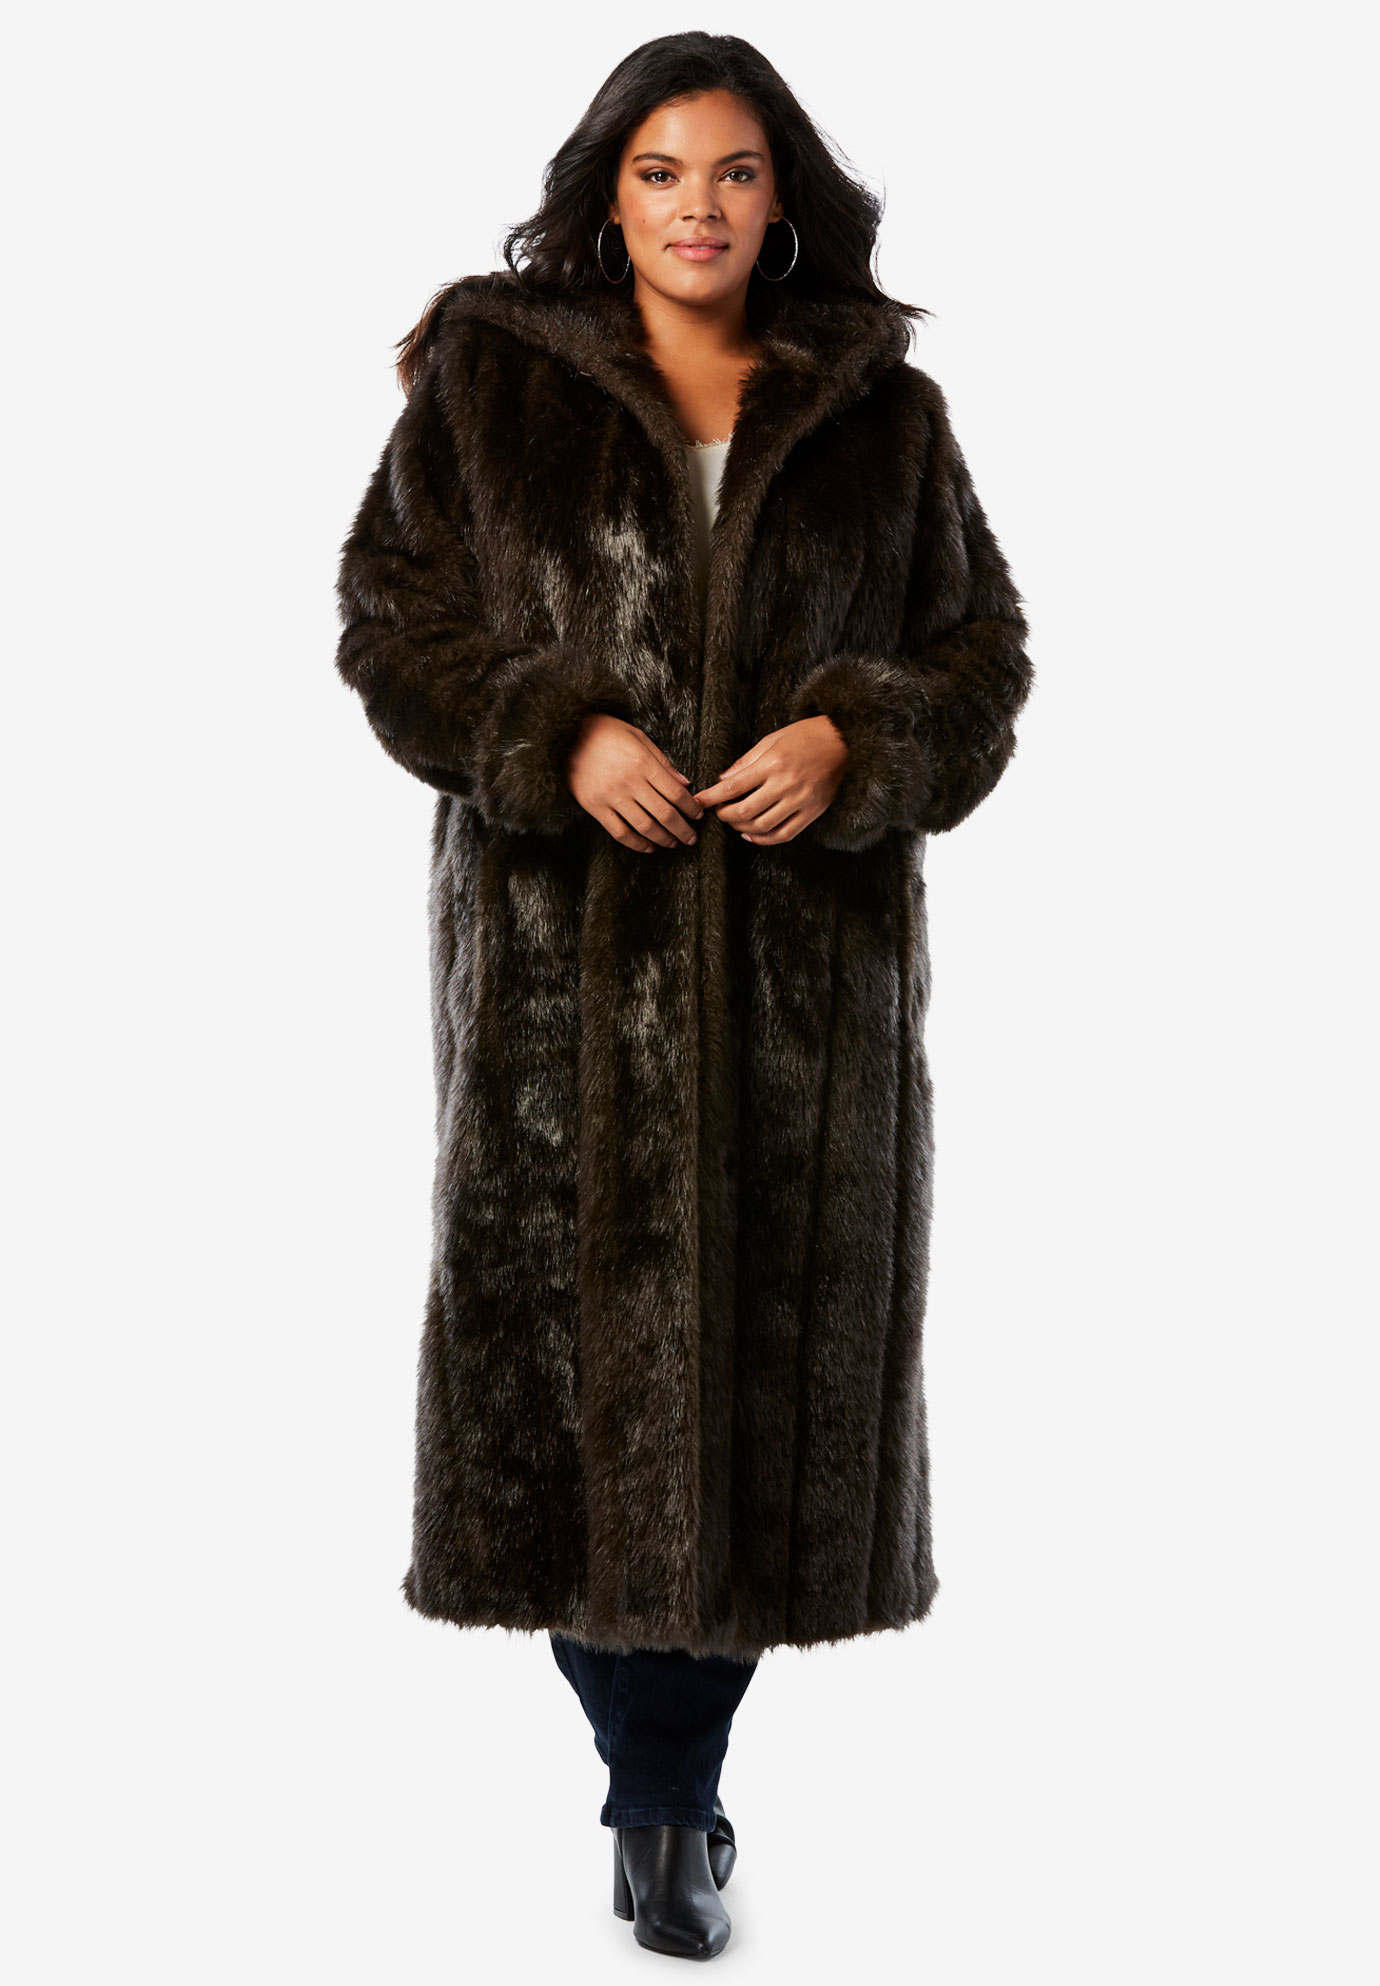 96eefc9d2b3 Full Length Faux-Fur Coat with Hood